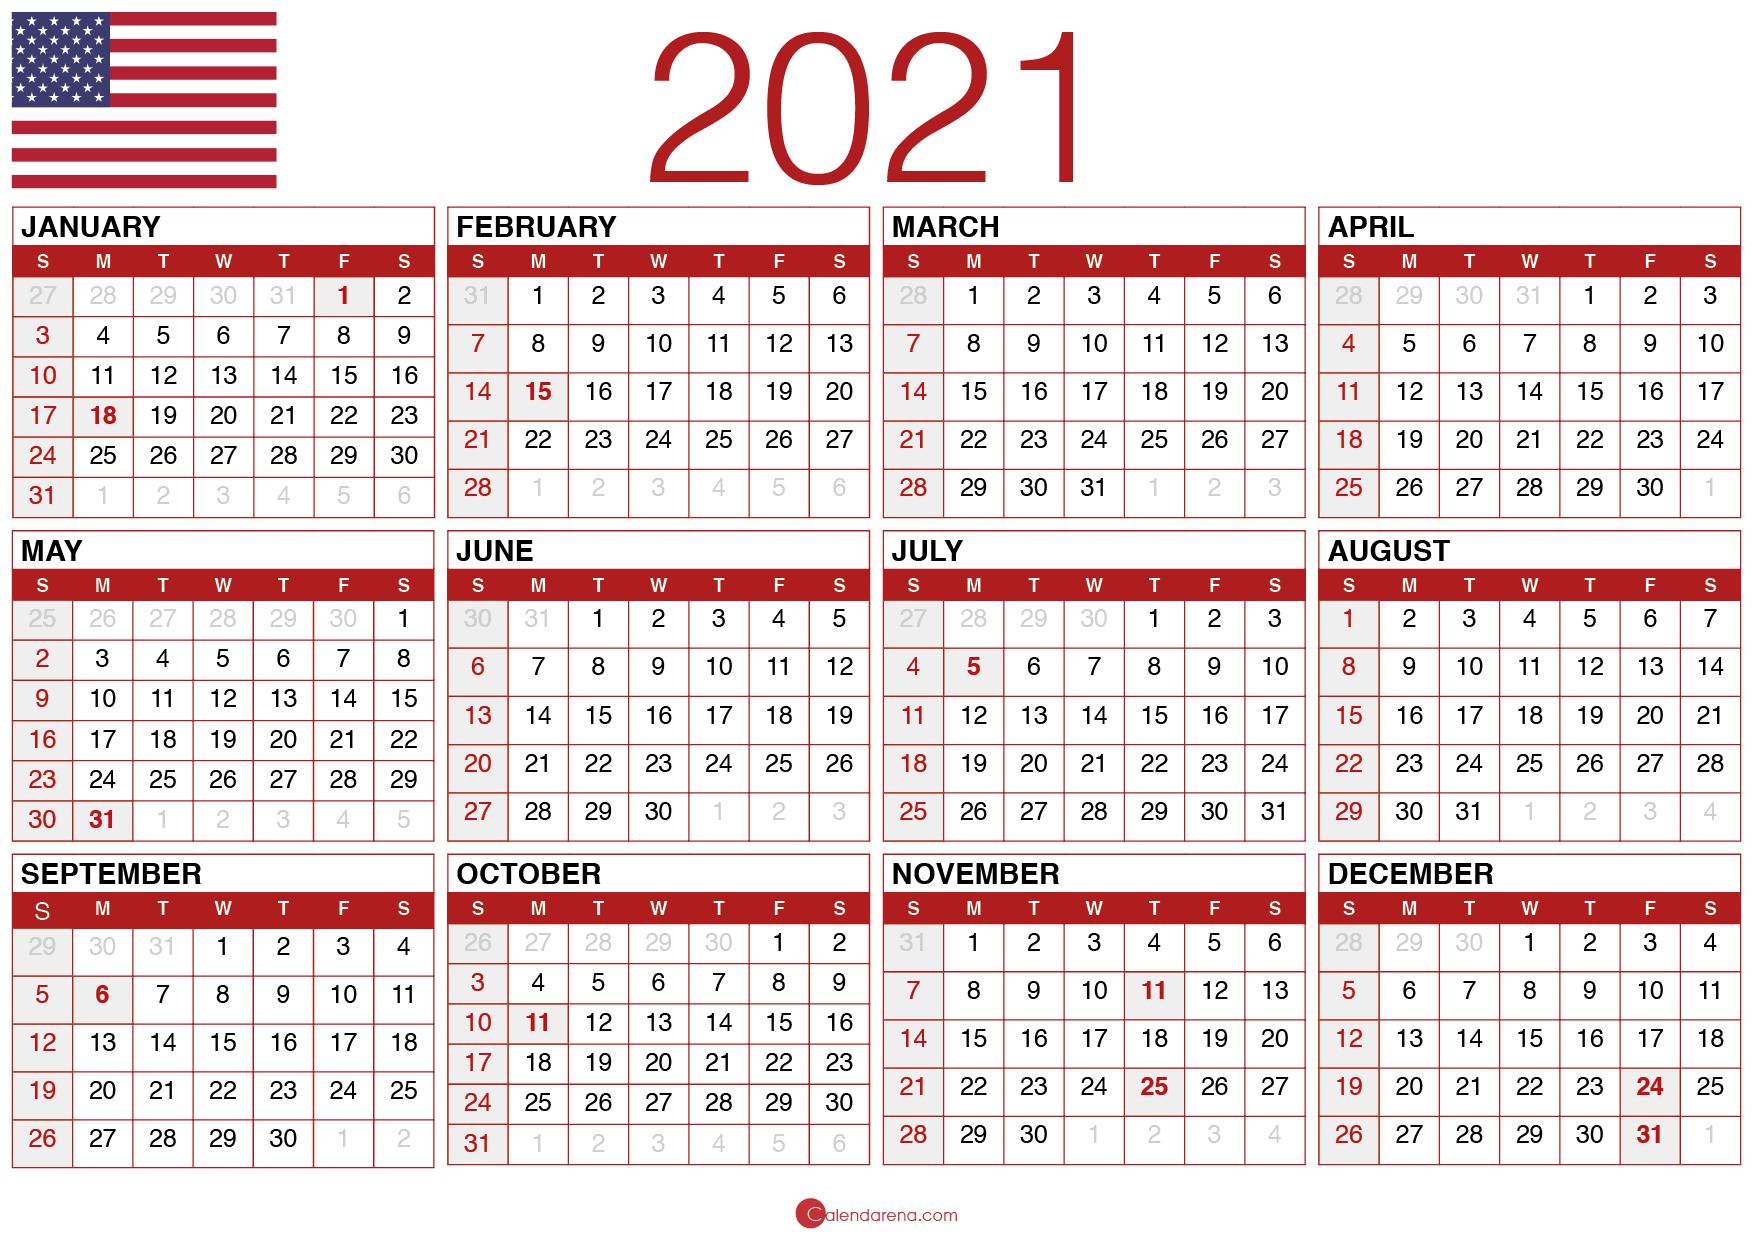 Download Free Printable Calendar 2021 - Calendarena